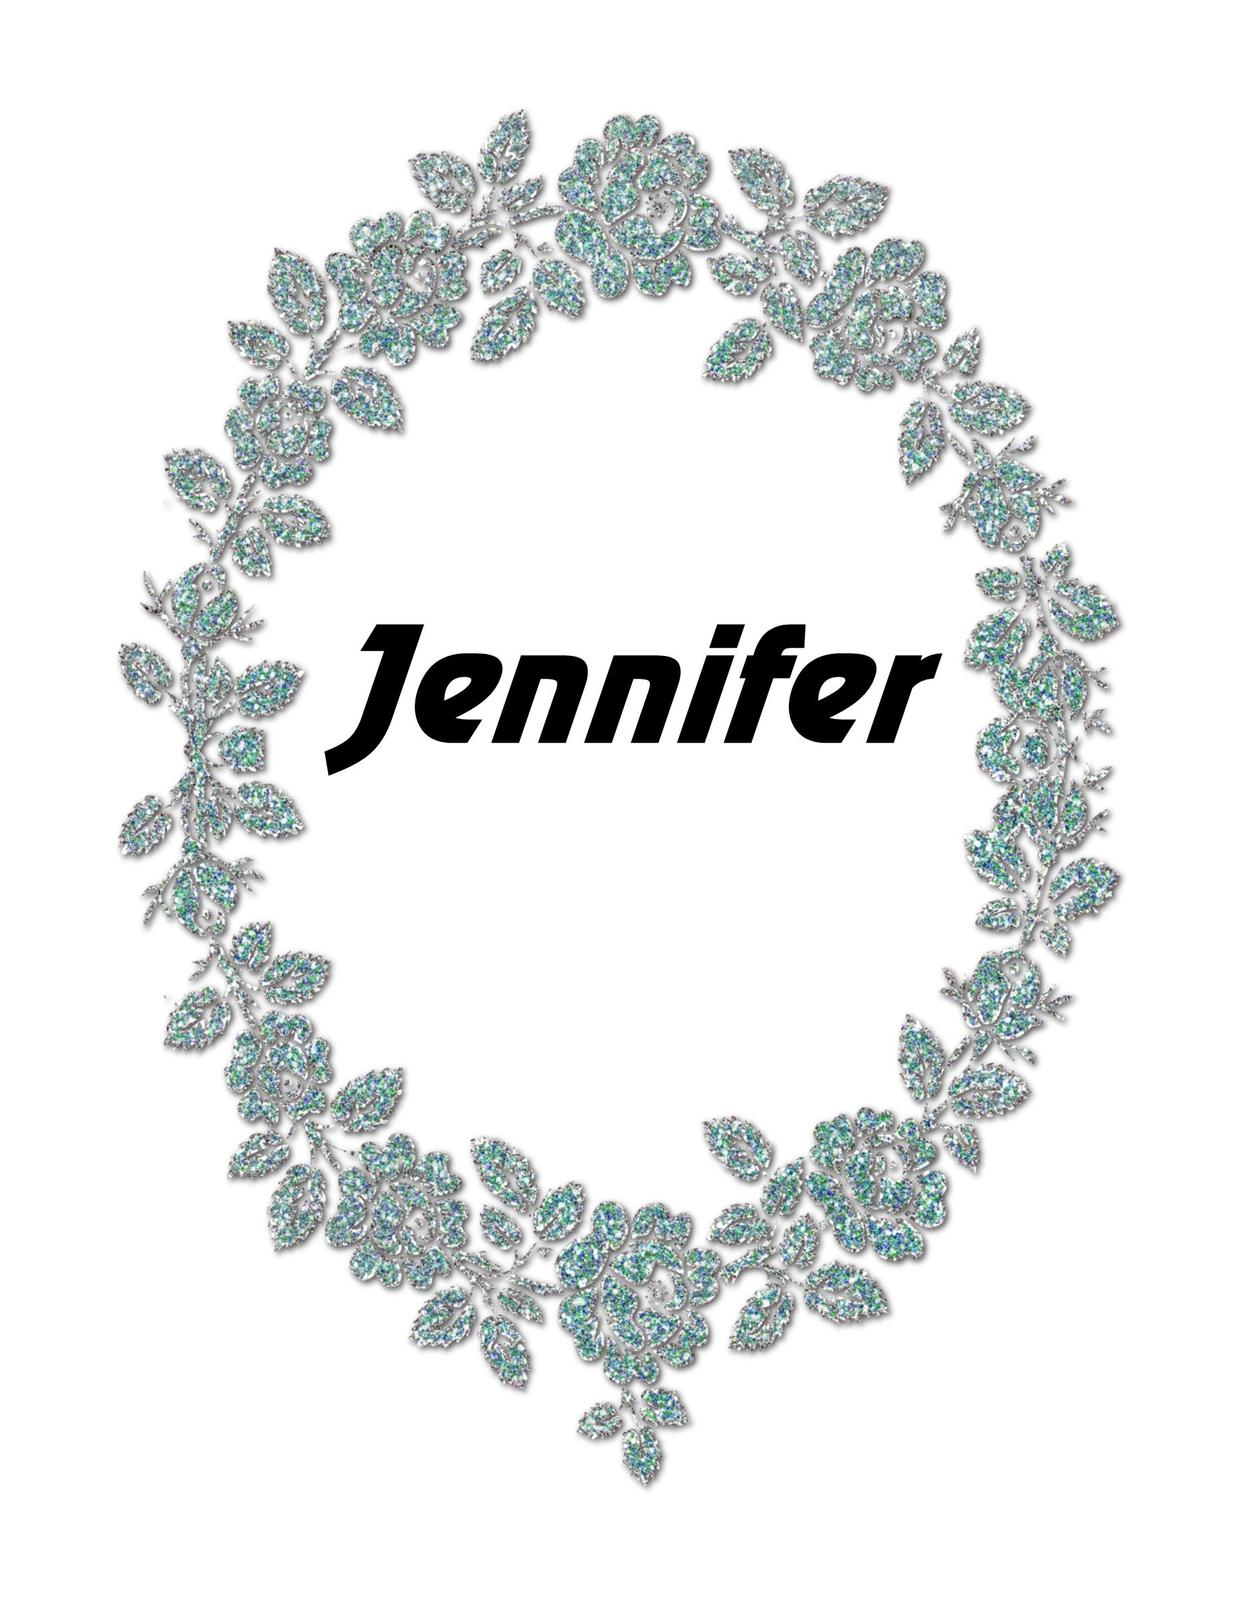 Jennifer Flower Glitter Digital Download ClipArt ArtClip Digital Card Making